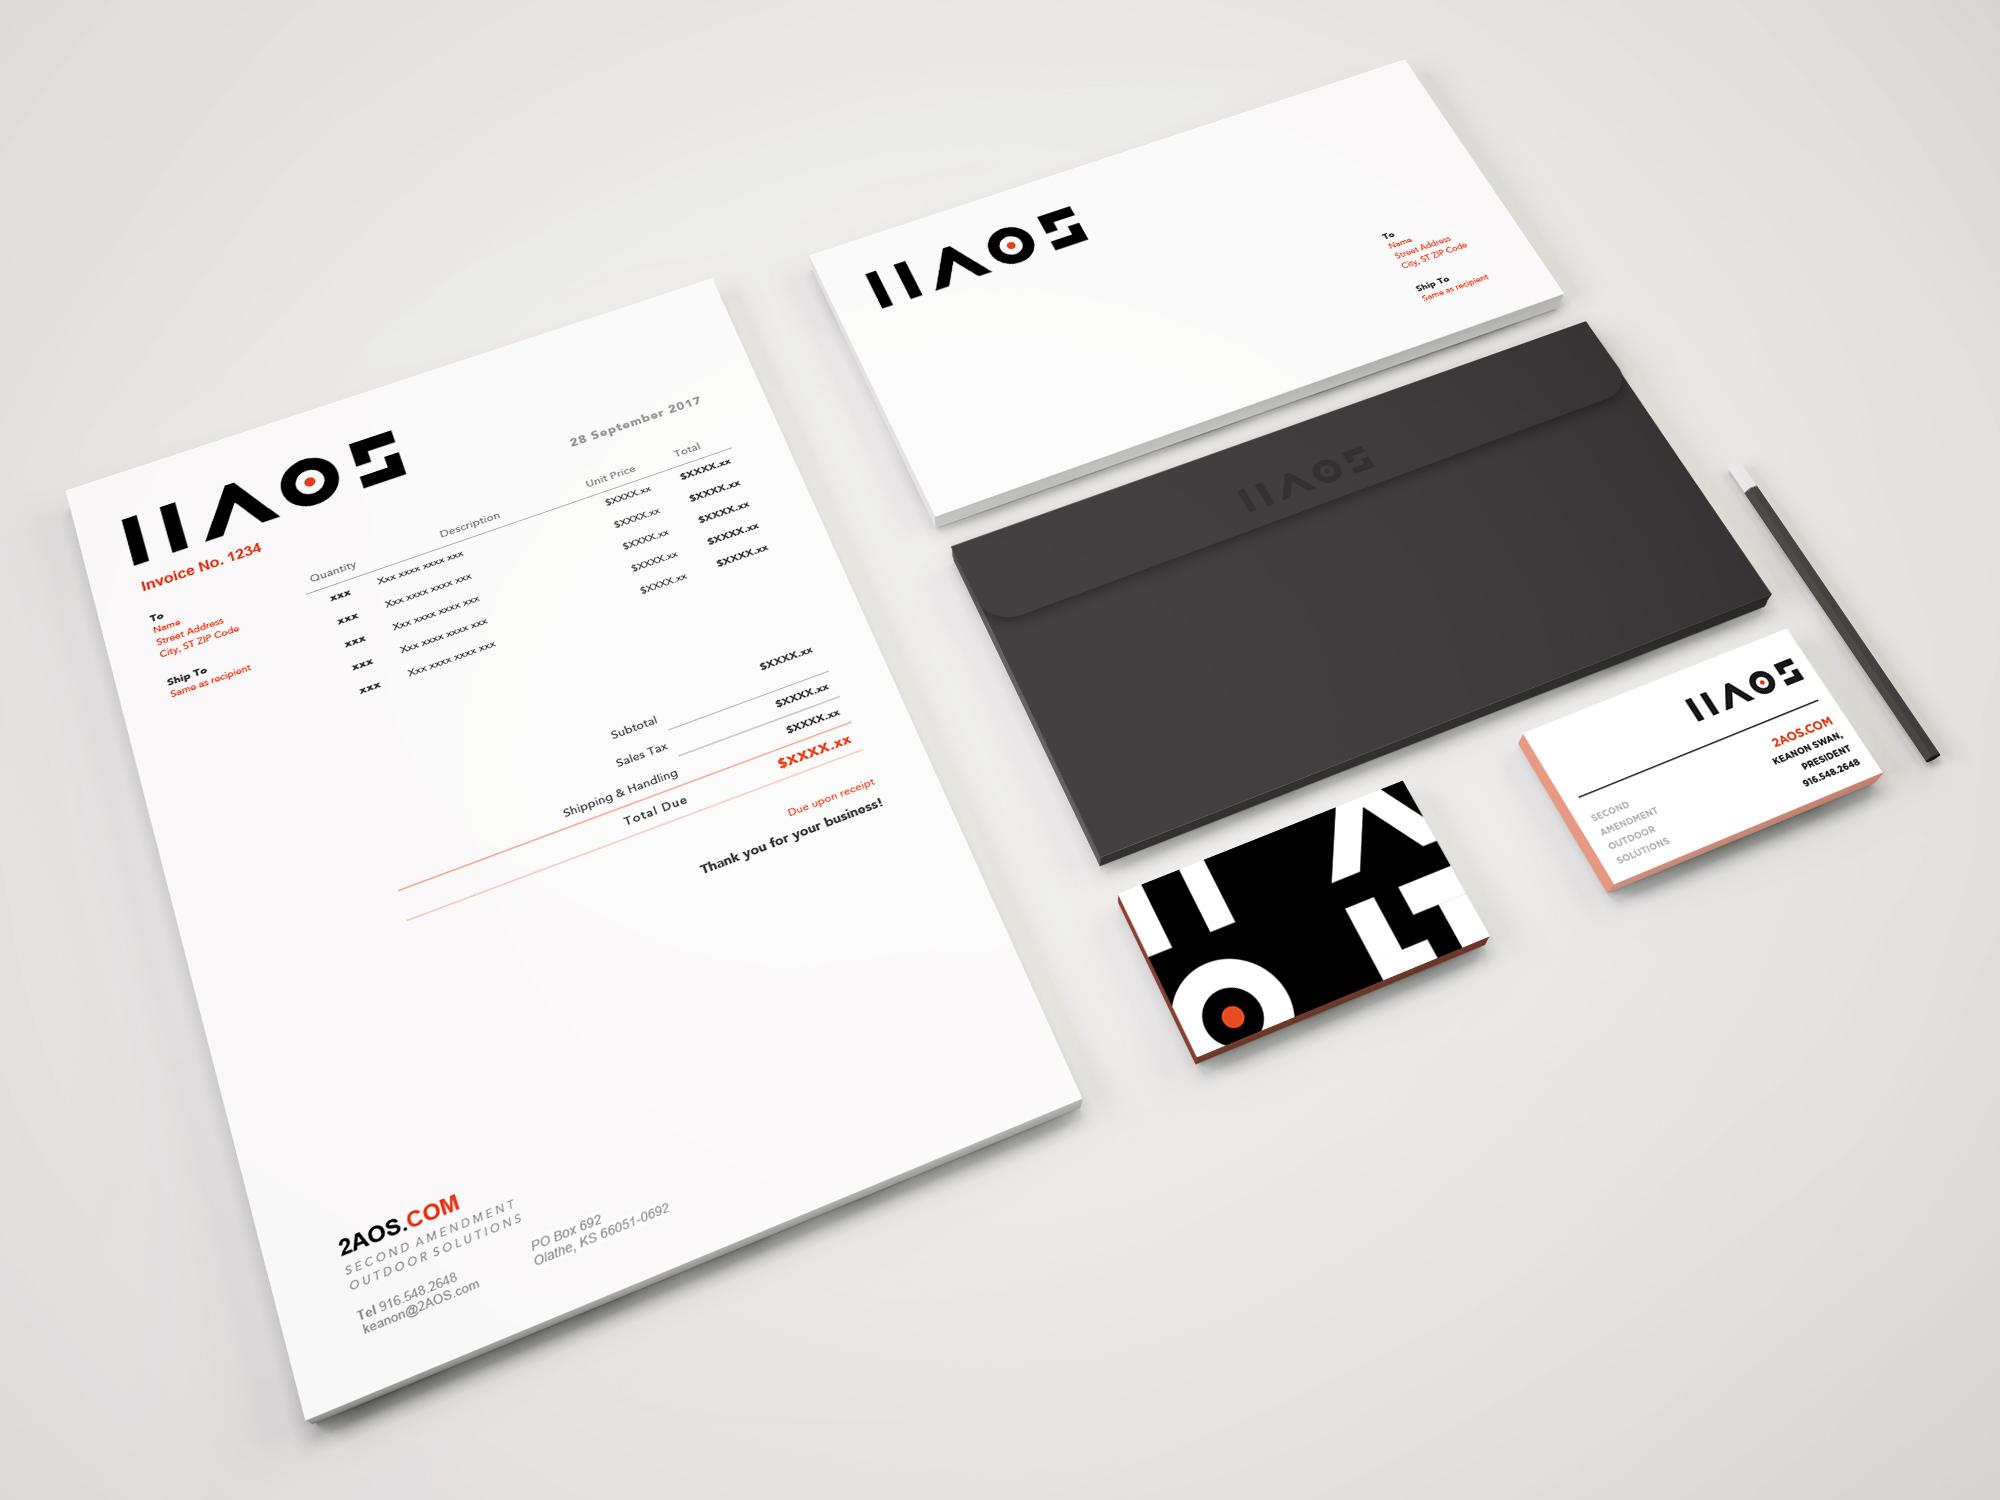 2AOS_stationary_business-cards_web-1.jpg